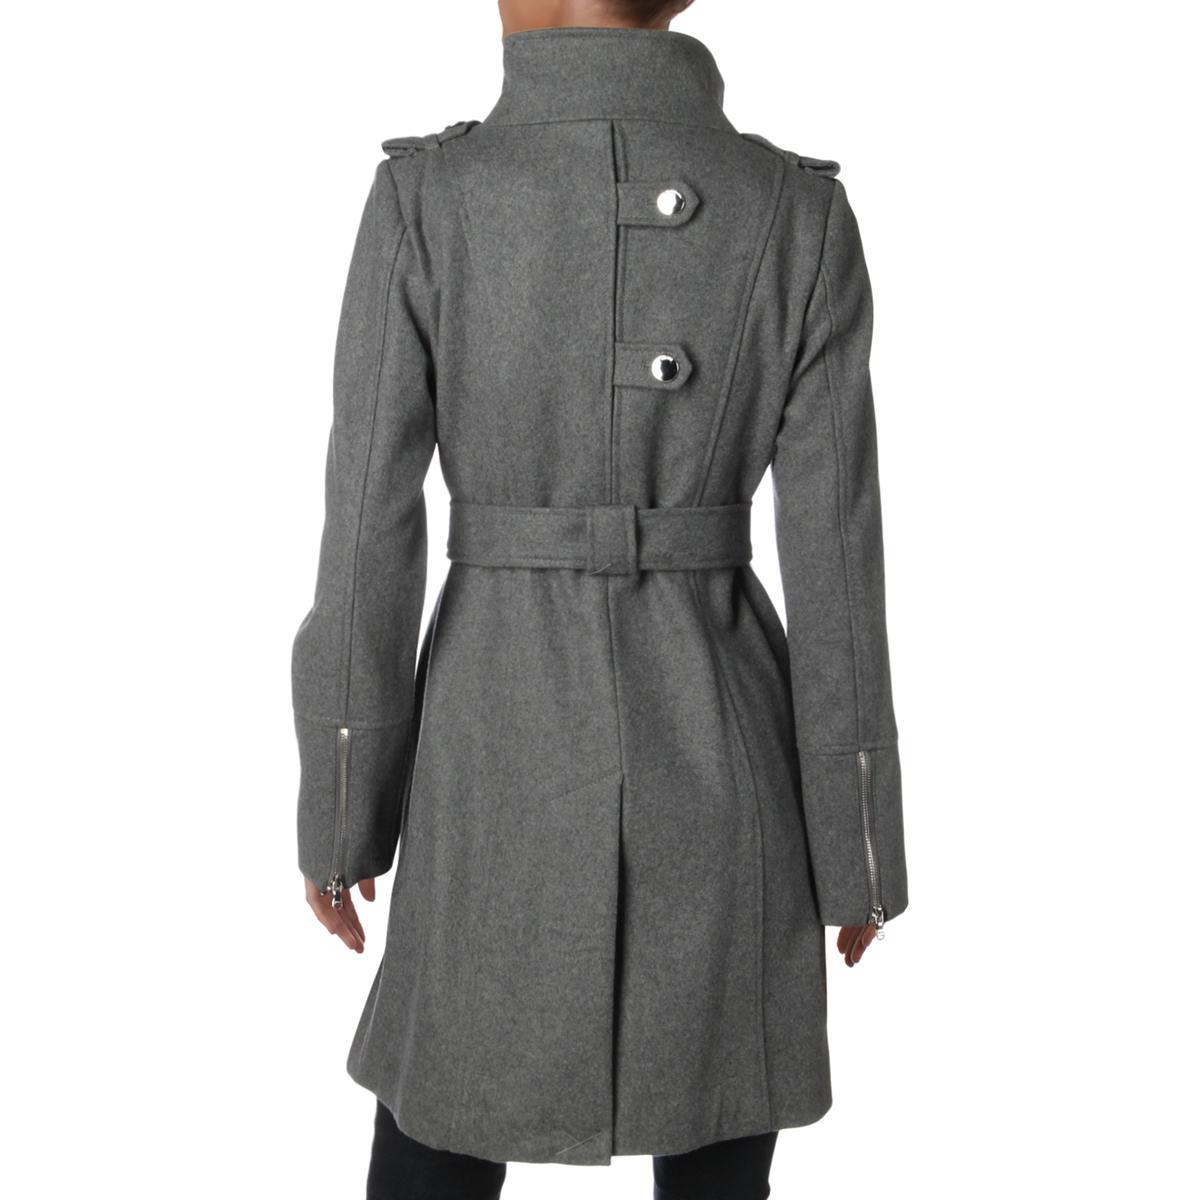 Guess Womens Gray Wool Blend Winter Dressy Wrap Coat Outerwear XL BHFO 4578